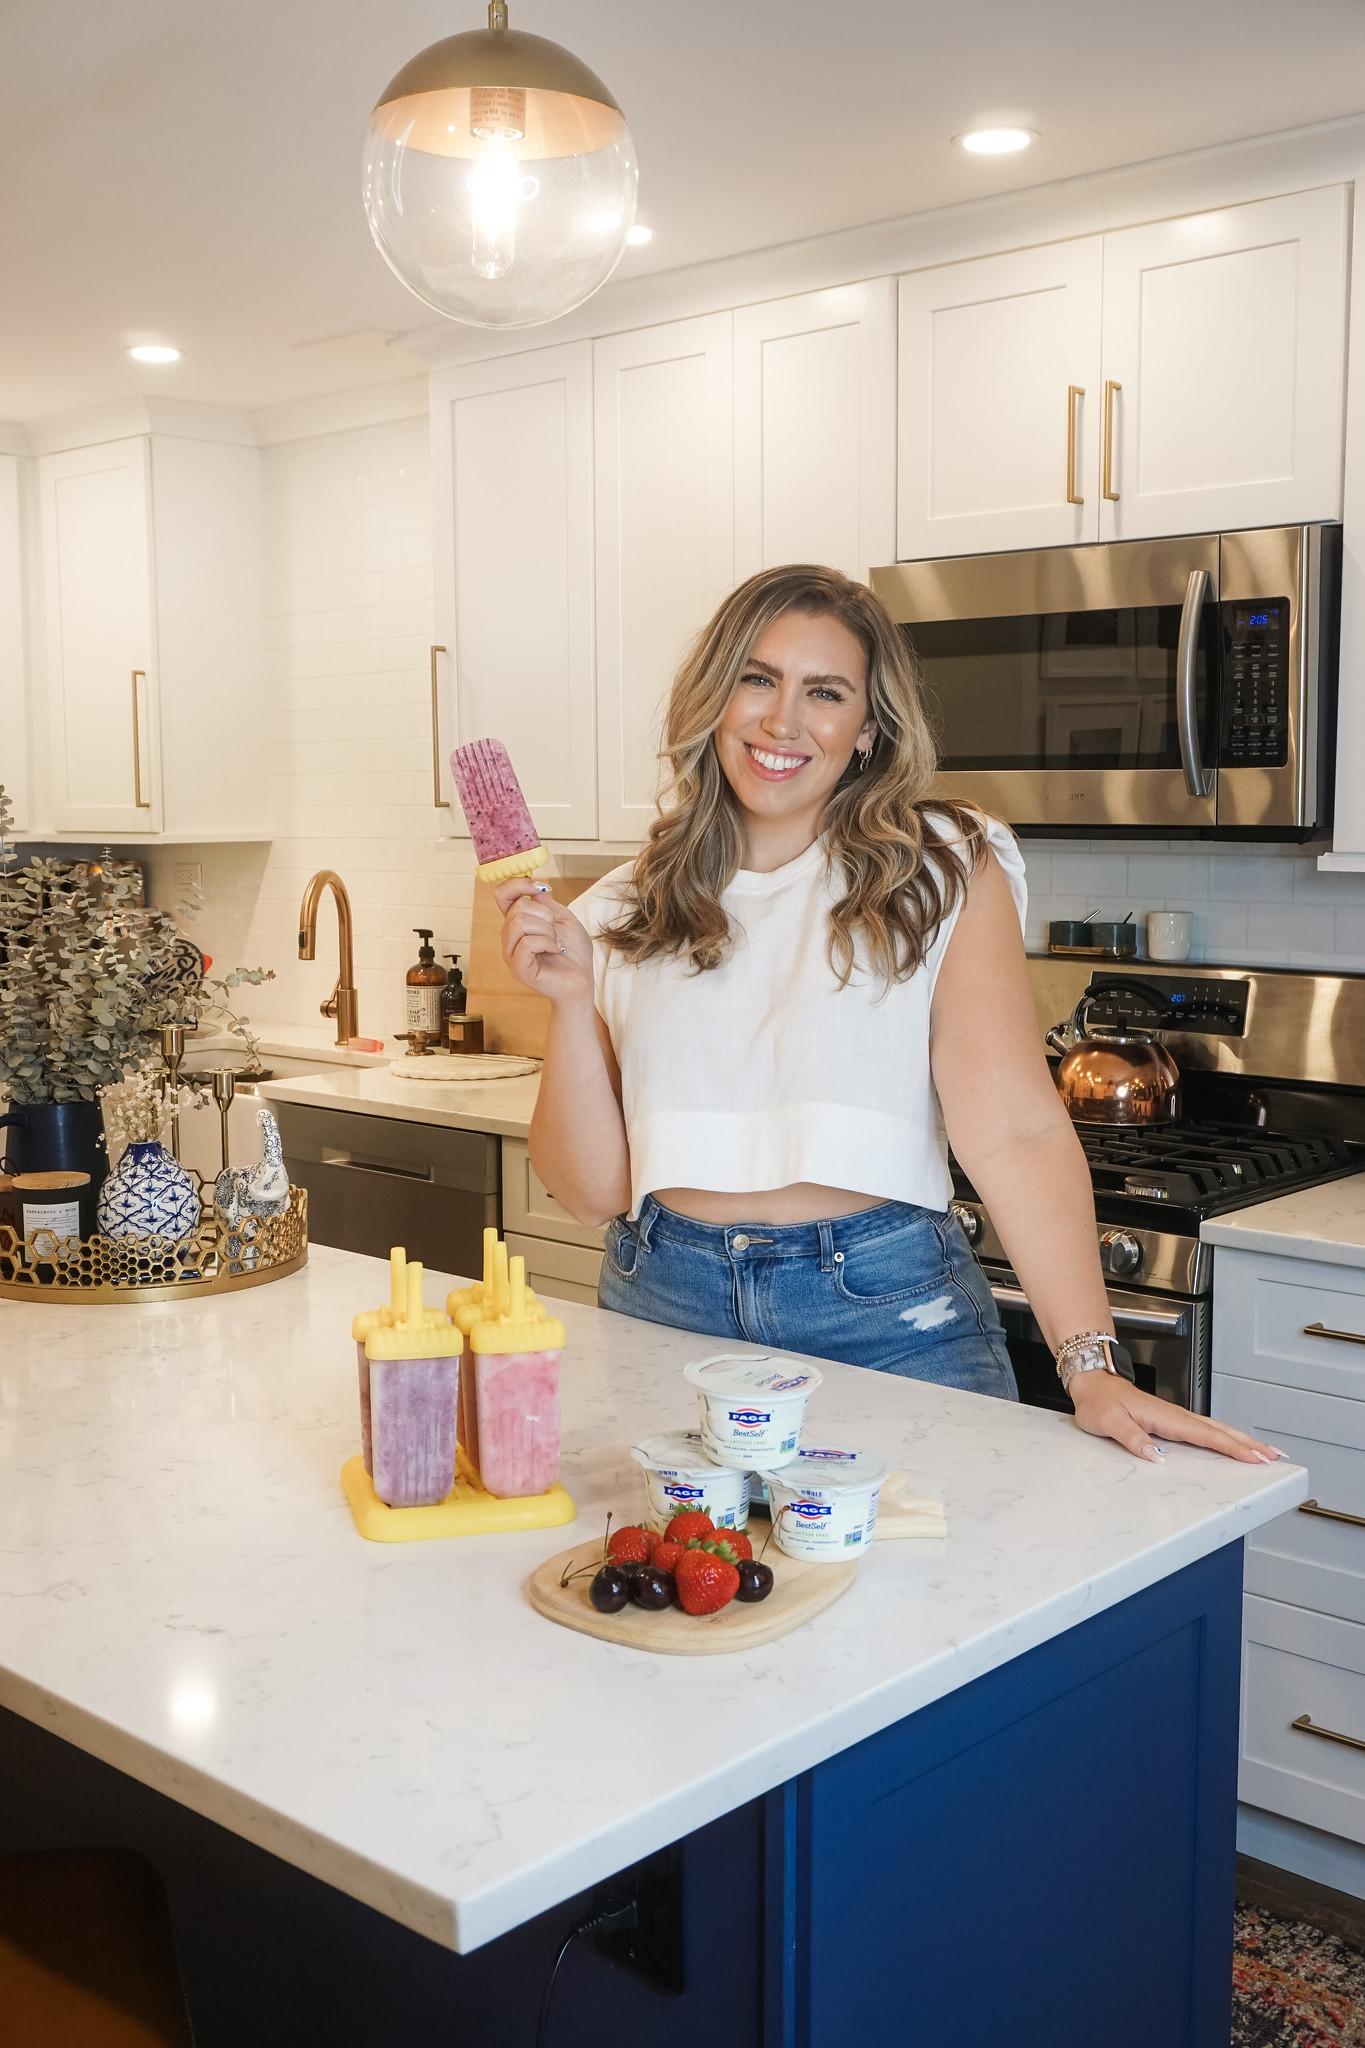 Easy Yogurt Ice Pop Recipe | How to Make Yogurt Ice Pops